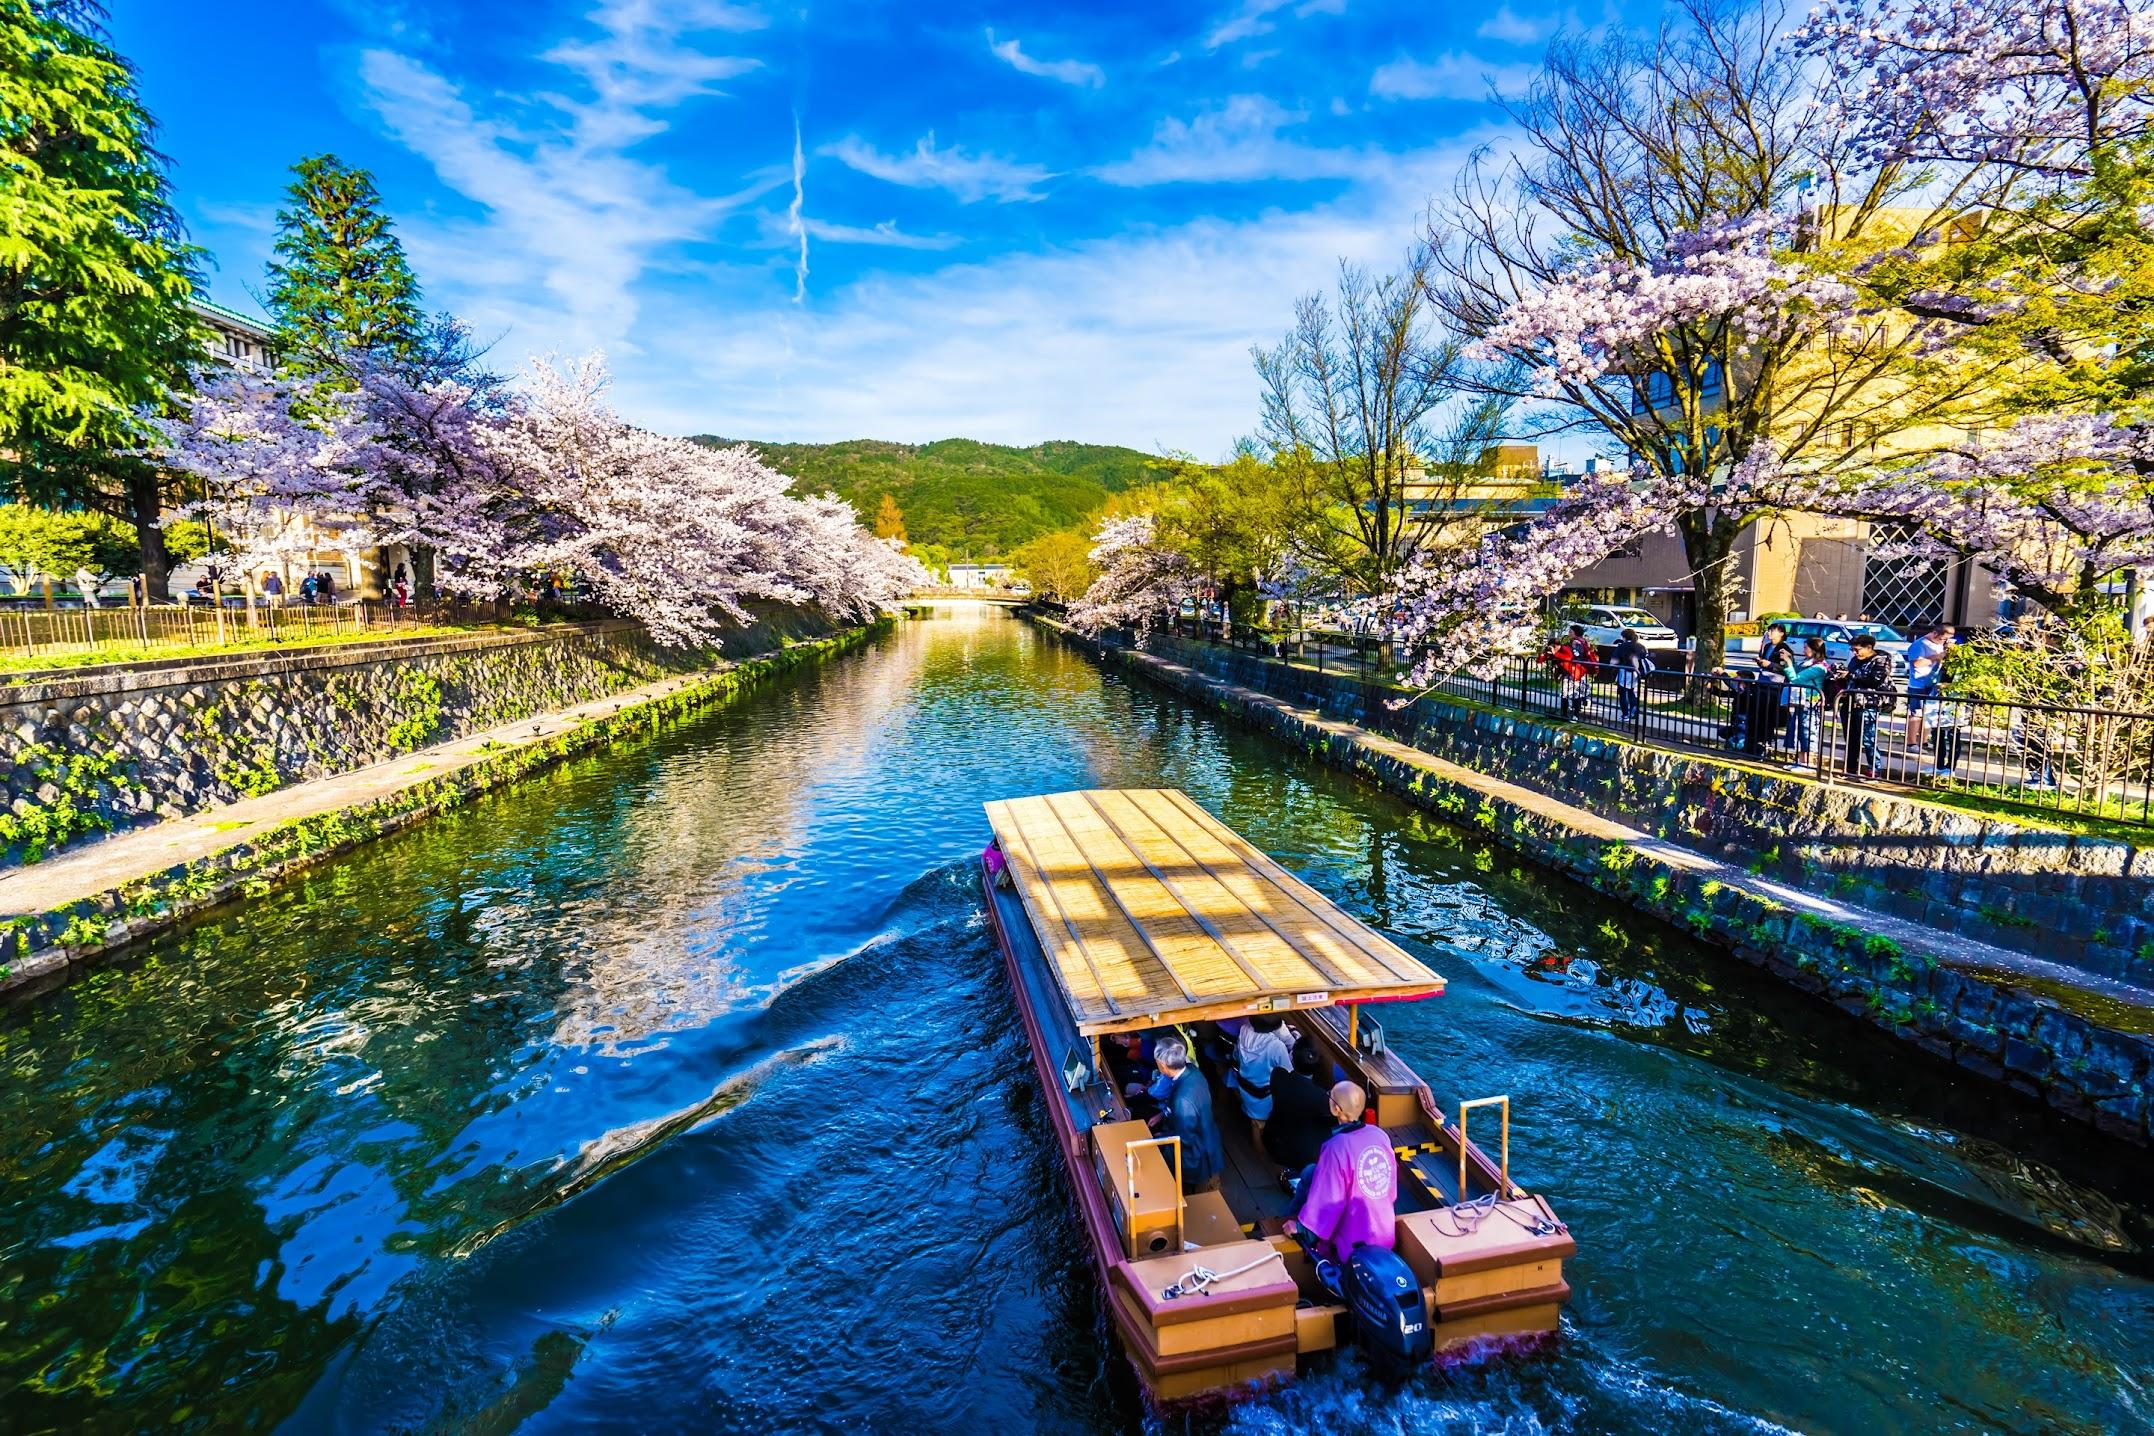 Kyoto okazaki canal cherry blossoms2